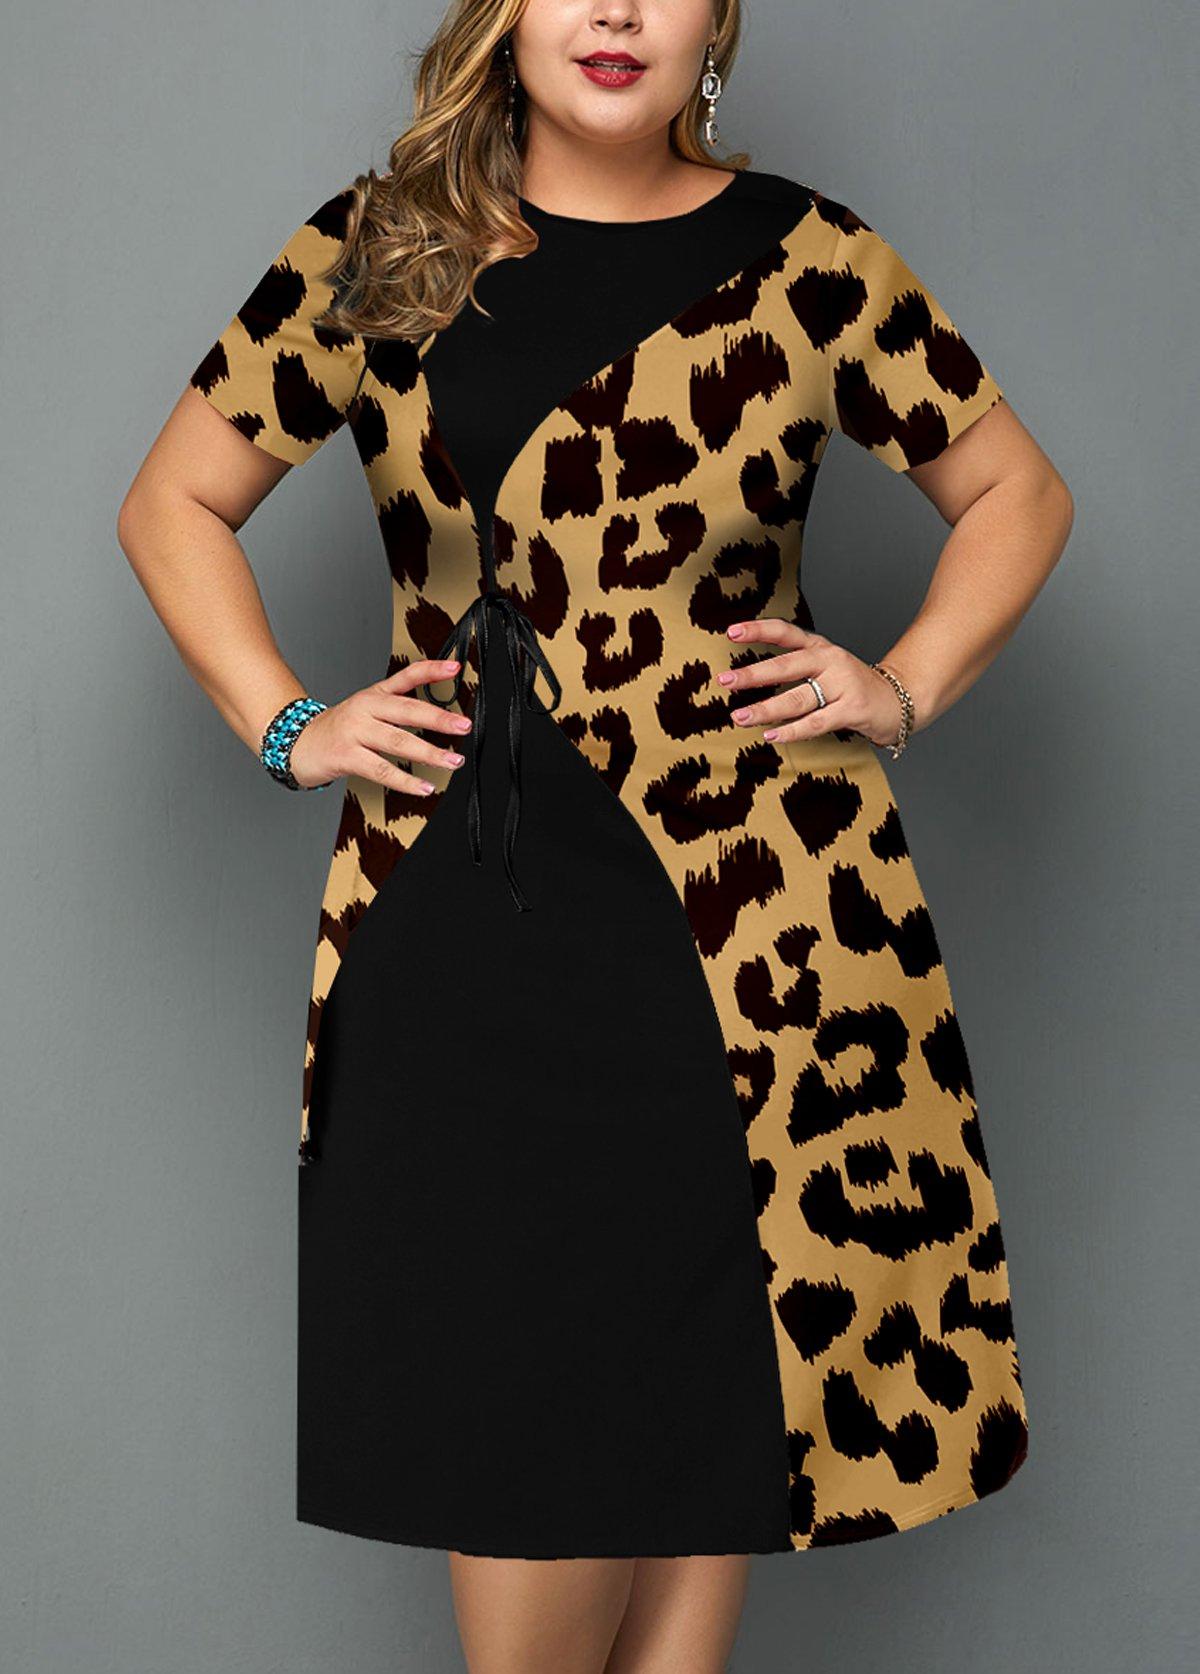 Leopard Plus Size Short Sleeve Round Neck Dress